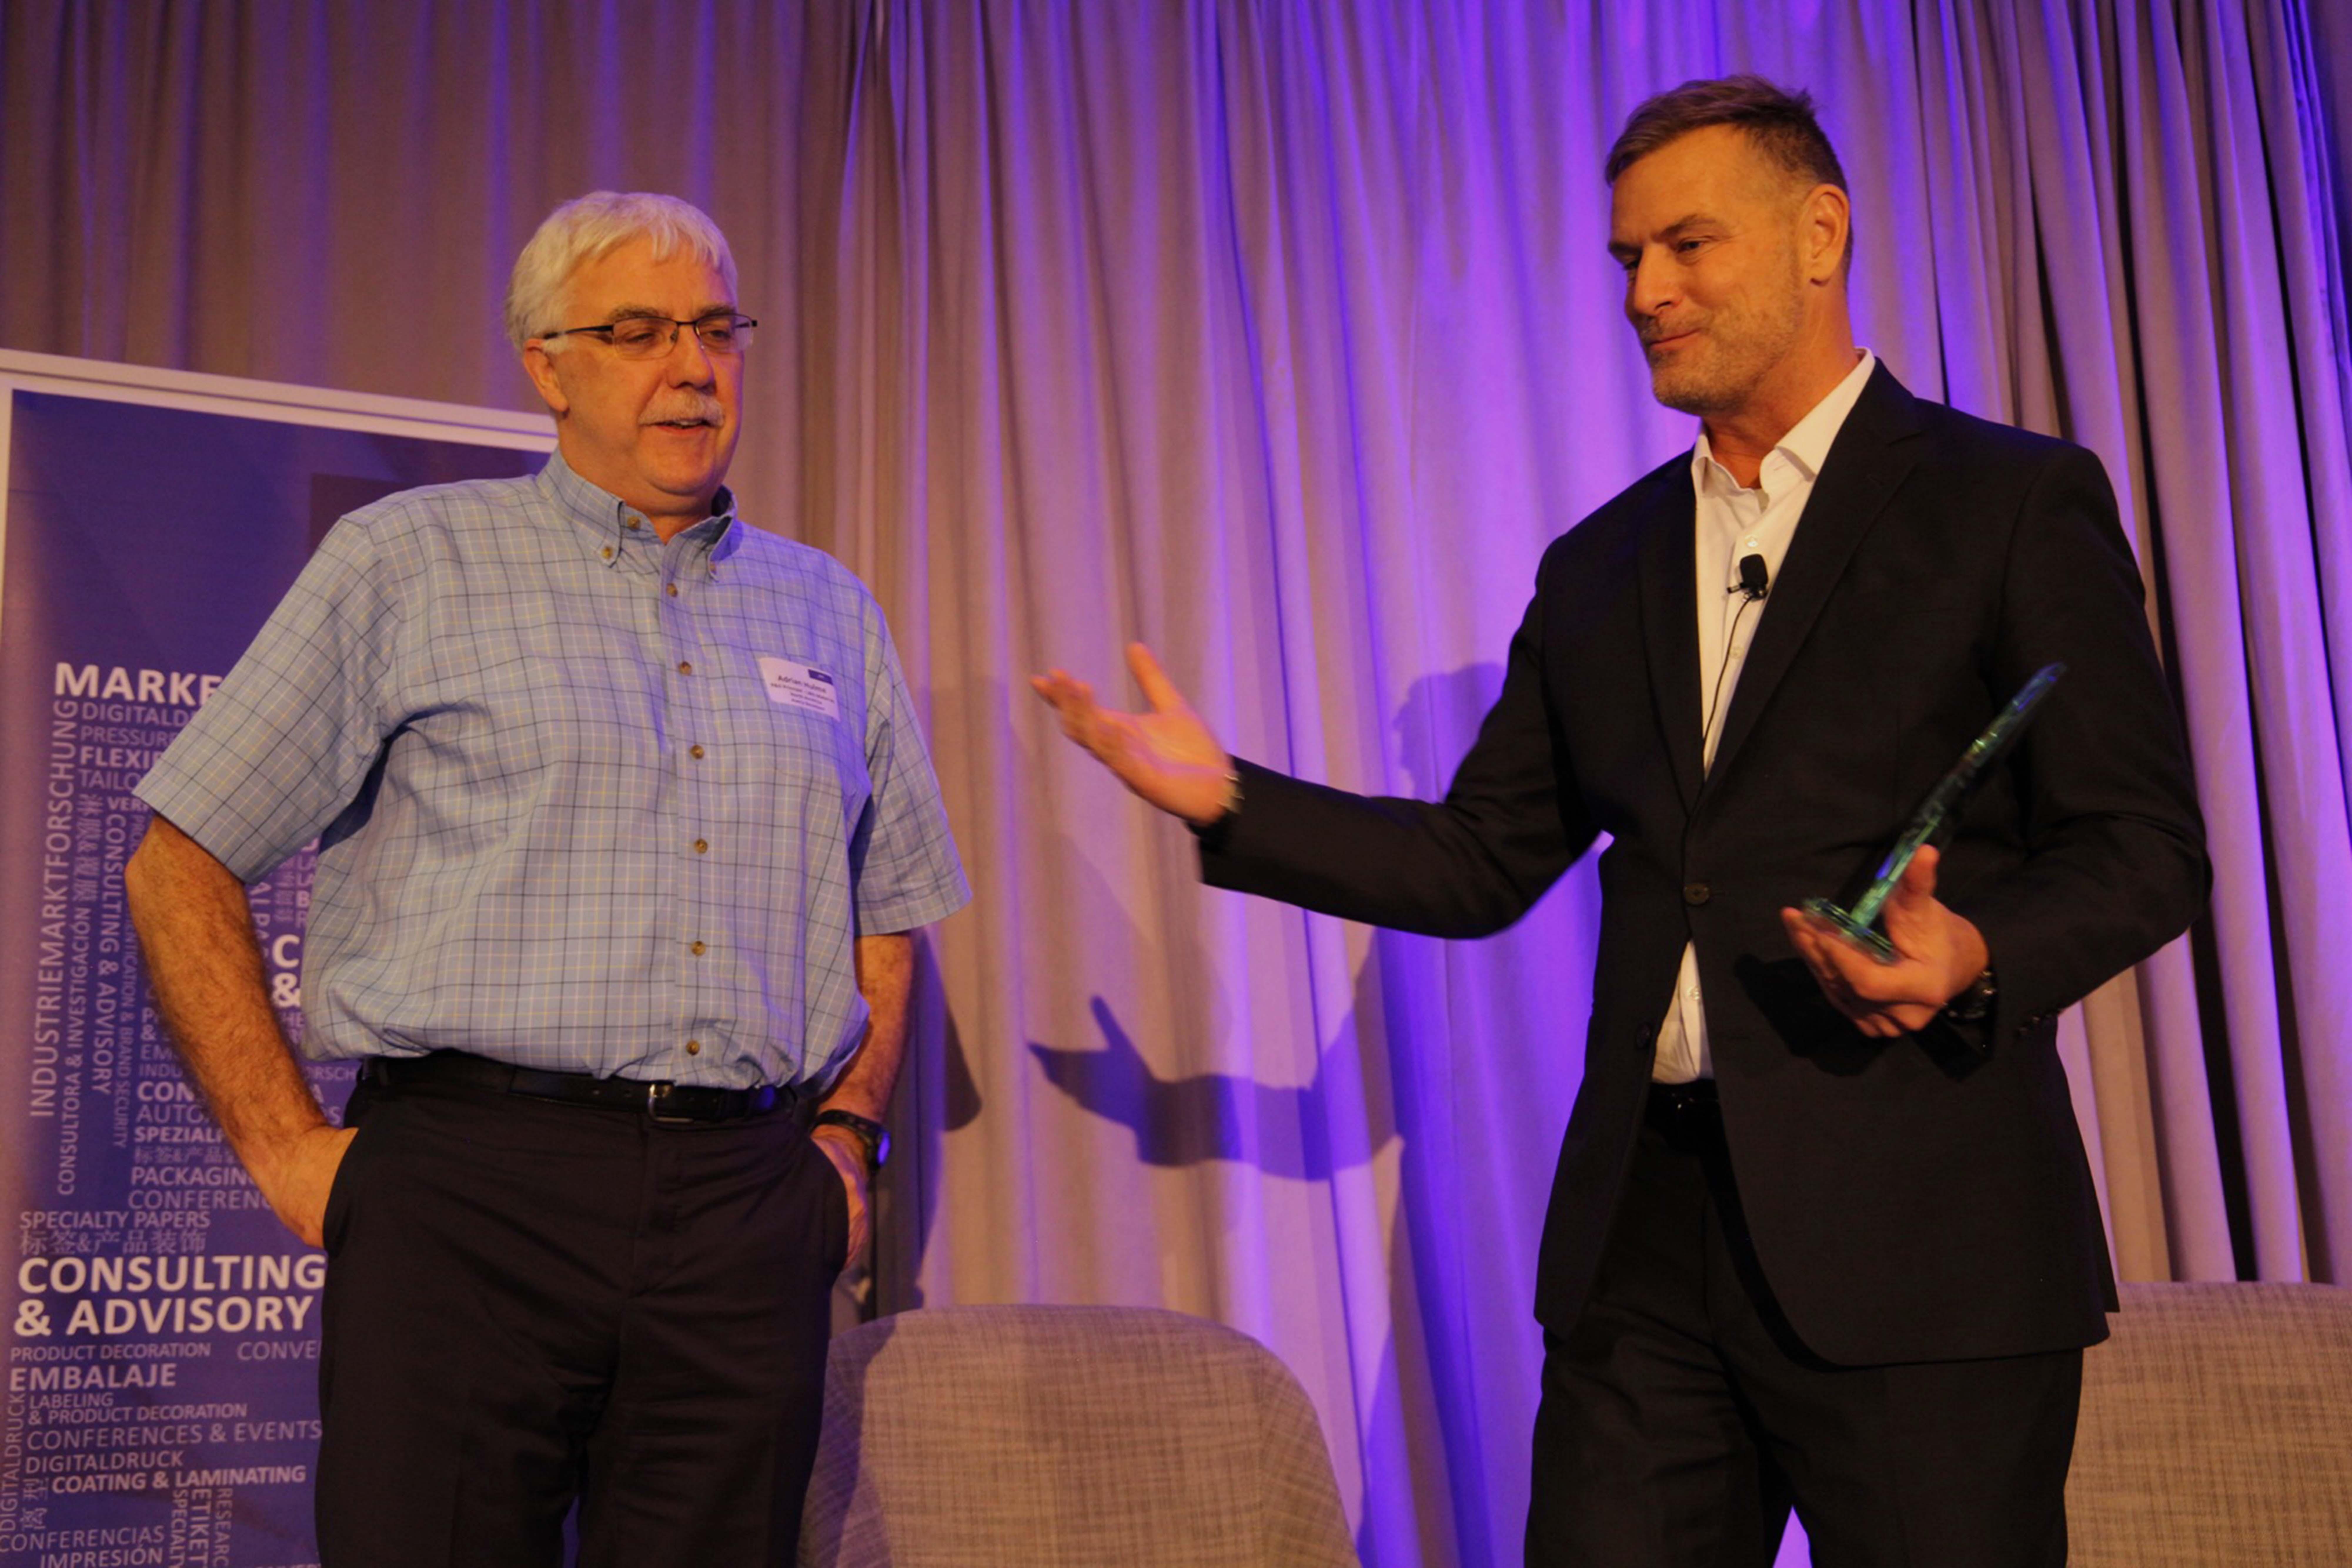 Adrian Hulme, Avery Dennison(left), receives the AWA Release Liner Industry Leadership Award from Corey Reardon, AWA Alexander Watson Associates.